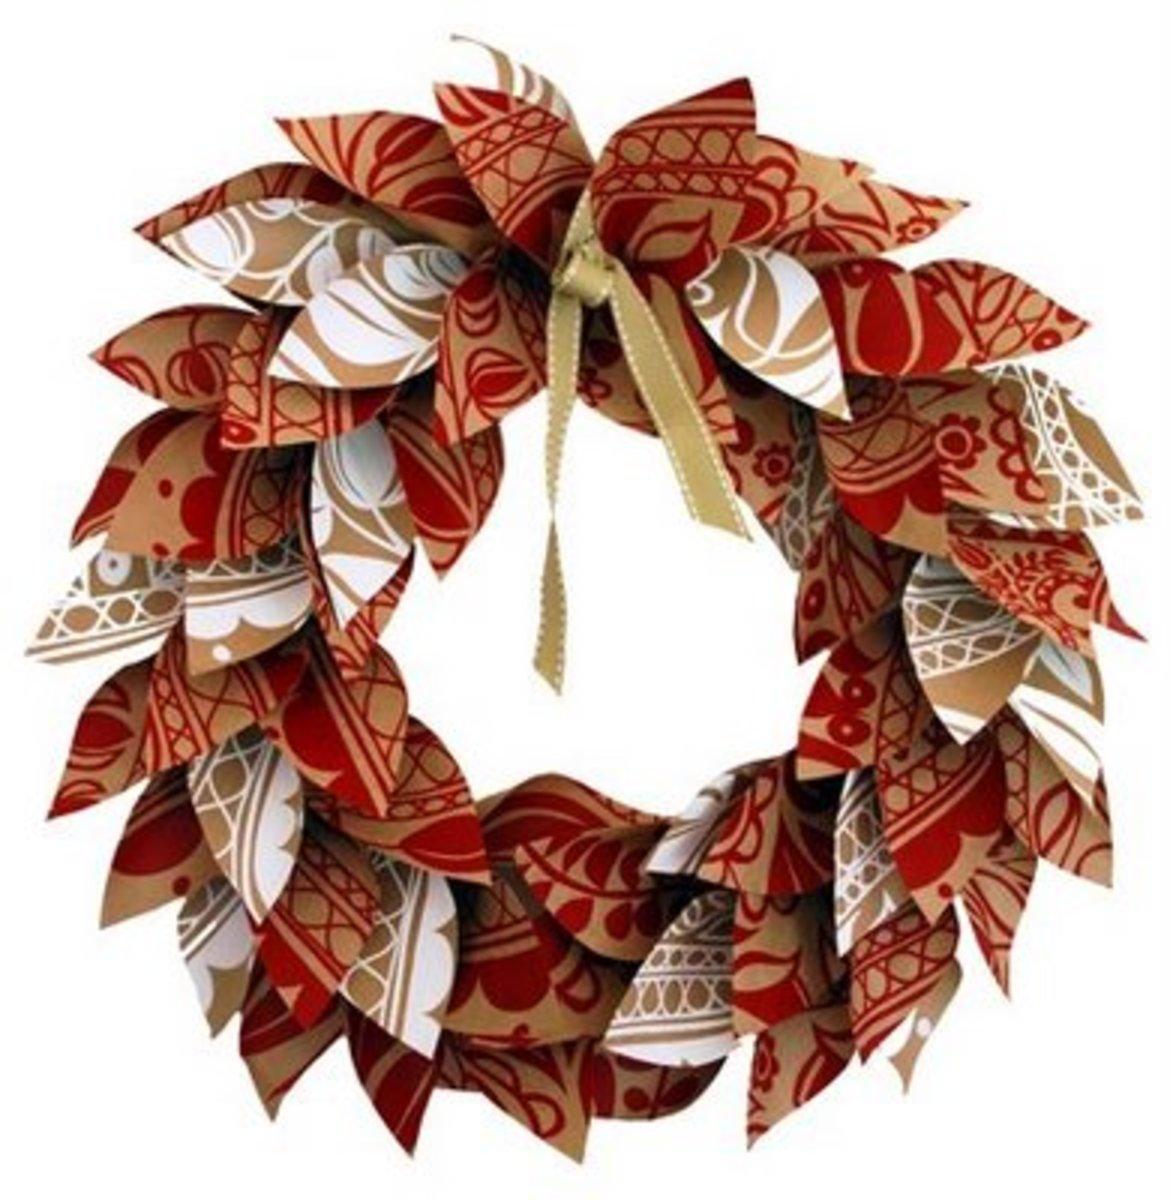 Paper Christmas Wreath         theredthreadblog.blogspot.com